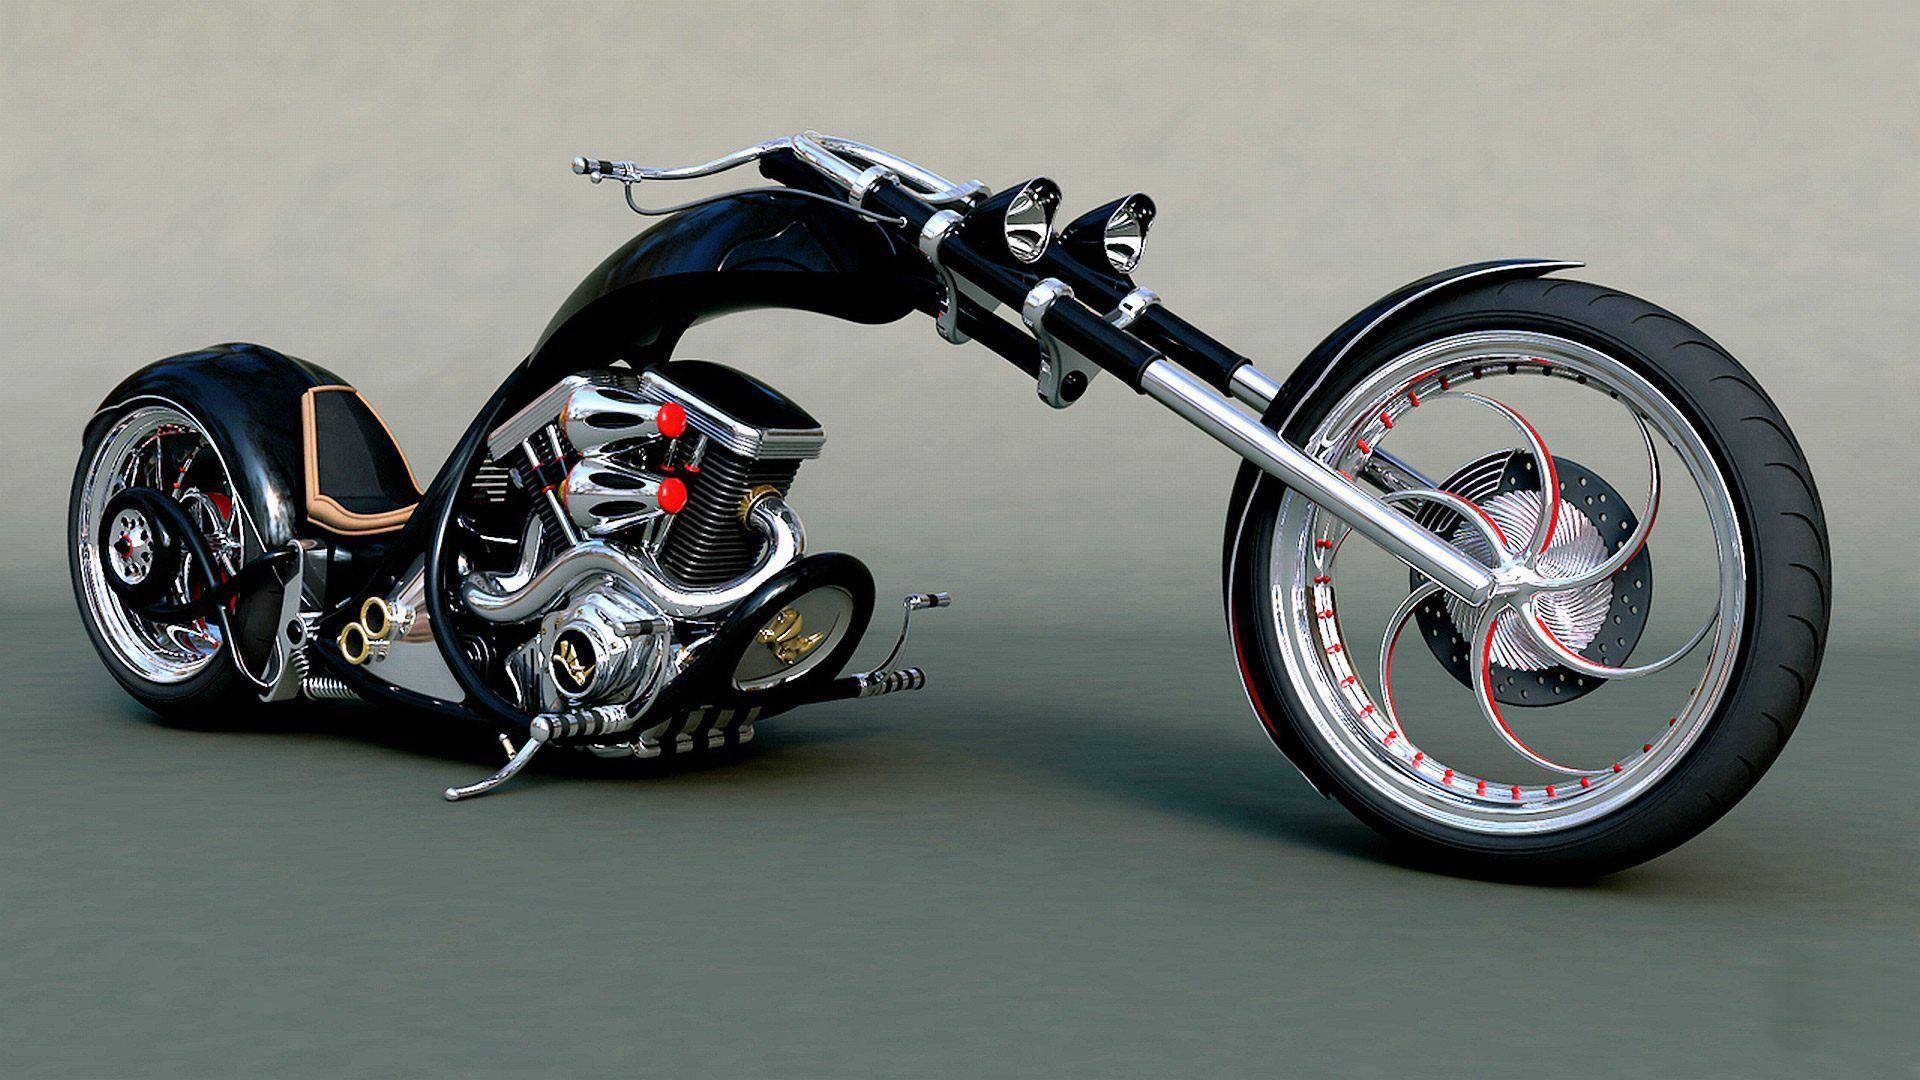 Motorcycle Desktop Wallpaper (64+ images)